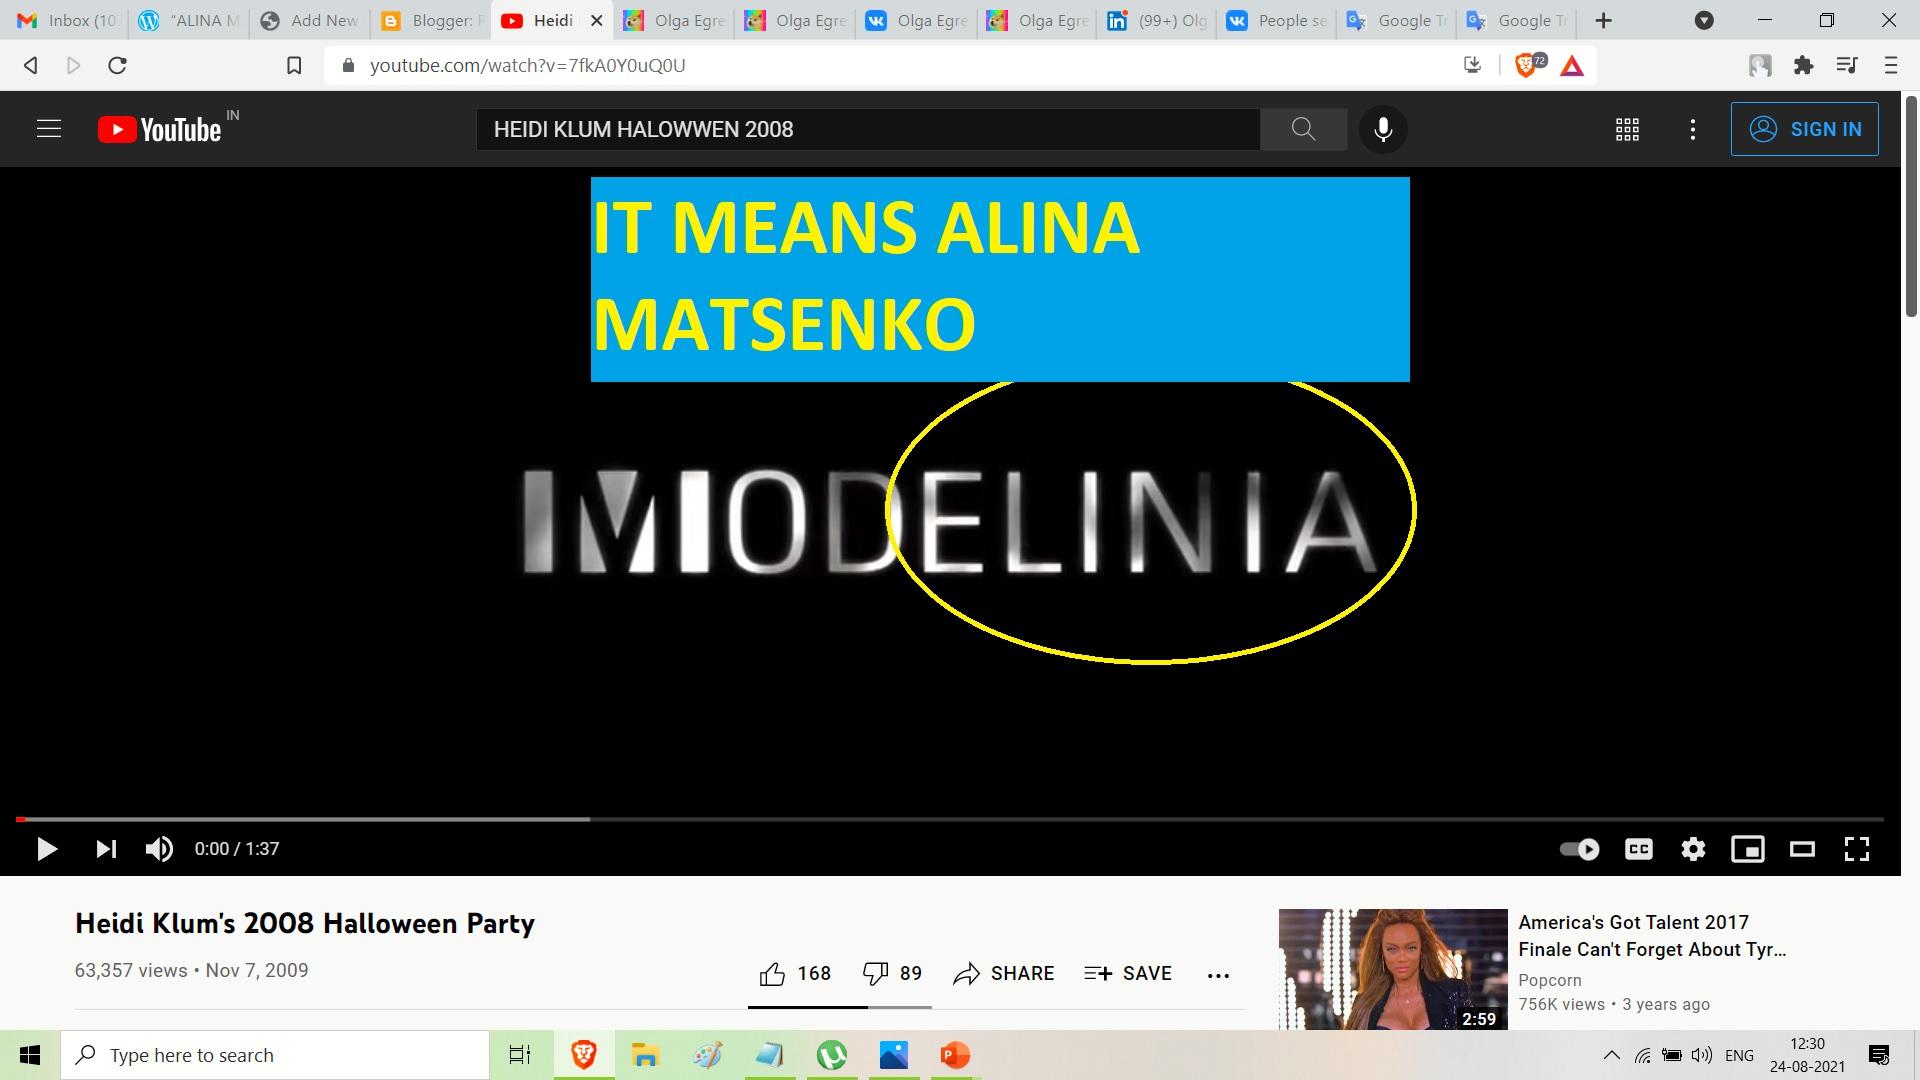 ALINA MASTENKO AND HEIDI KLUM - HALOWEEN 2008 --